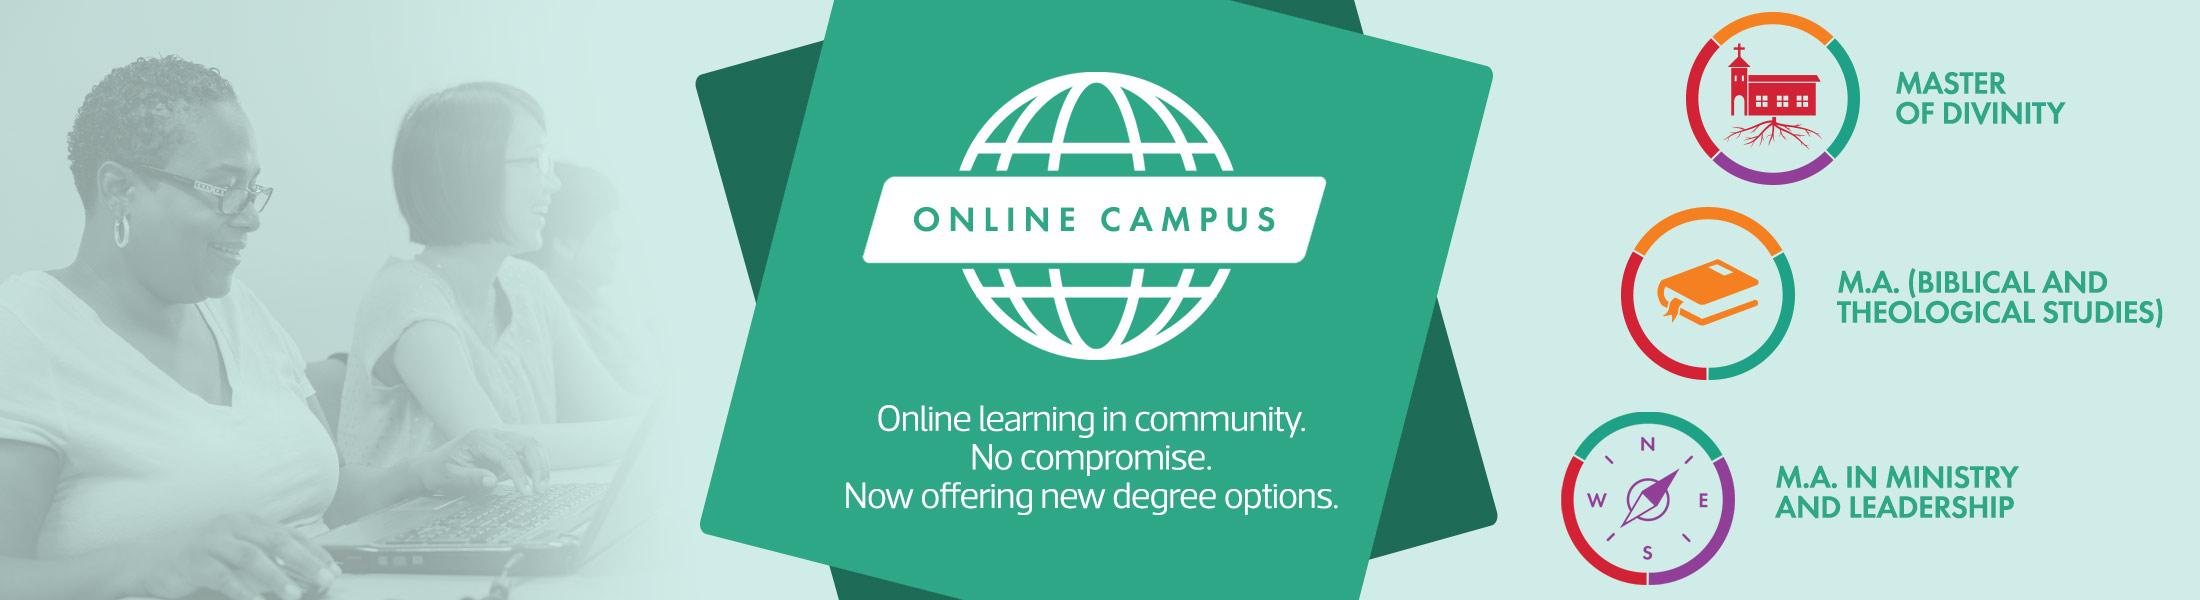 Online Seminary Degrees at Western Seminary